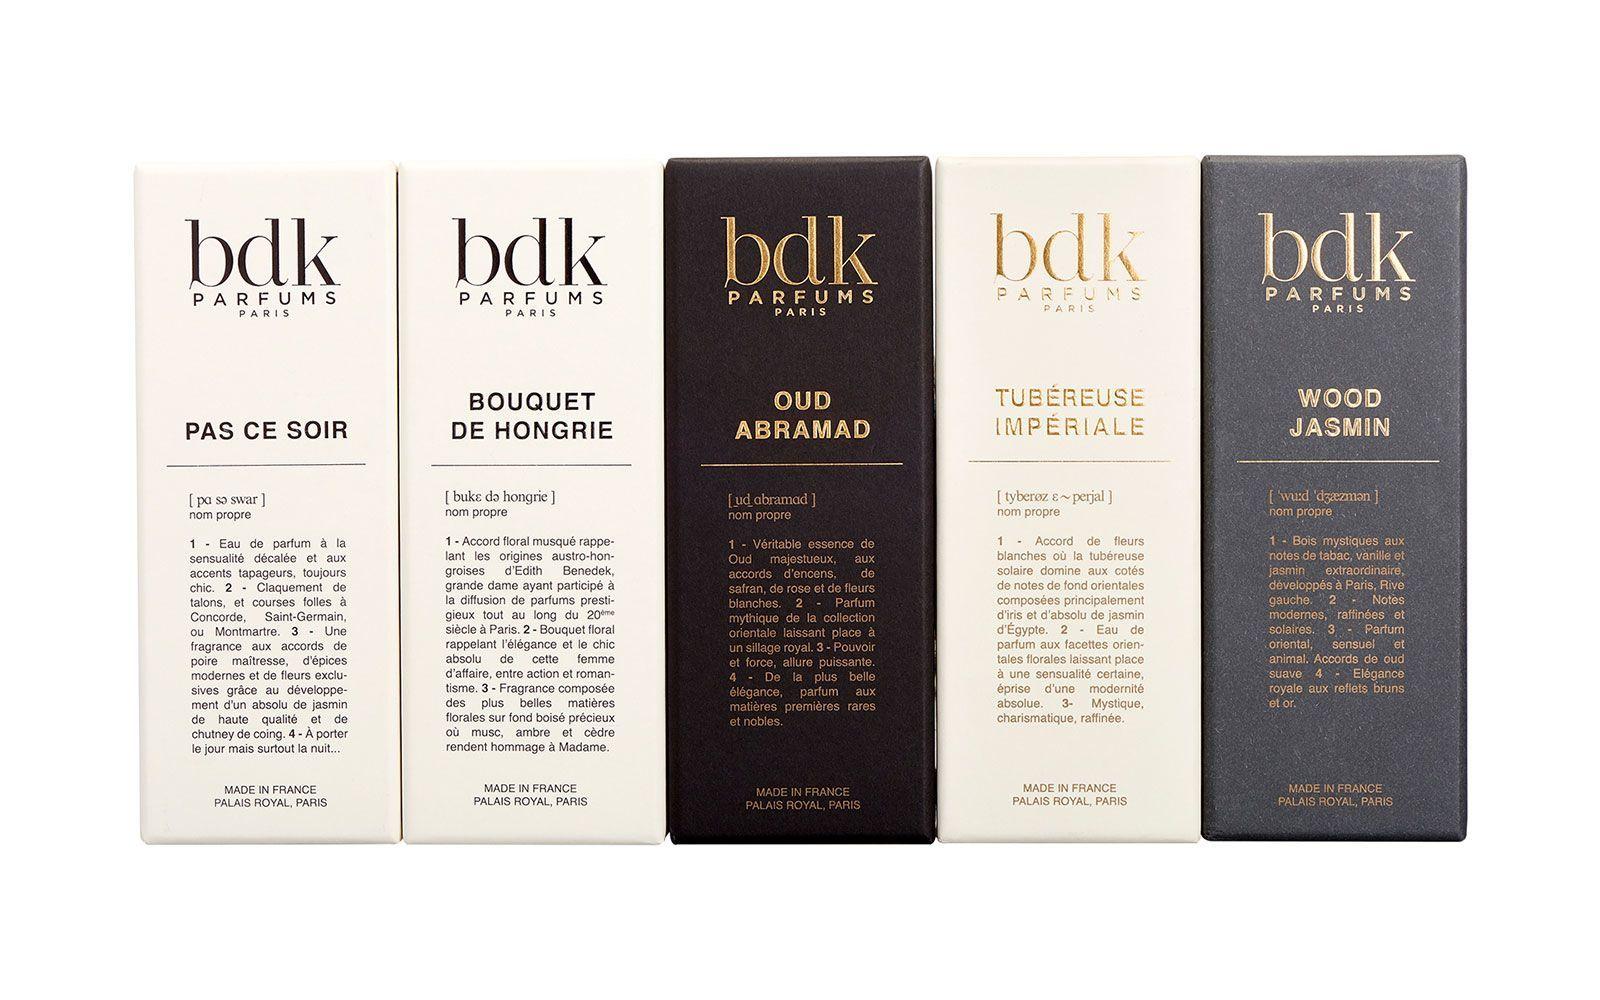 bdk-perfumes-paris